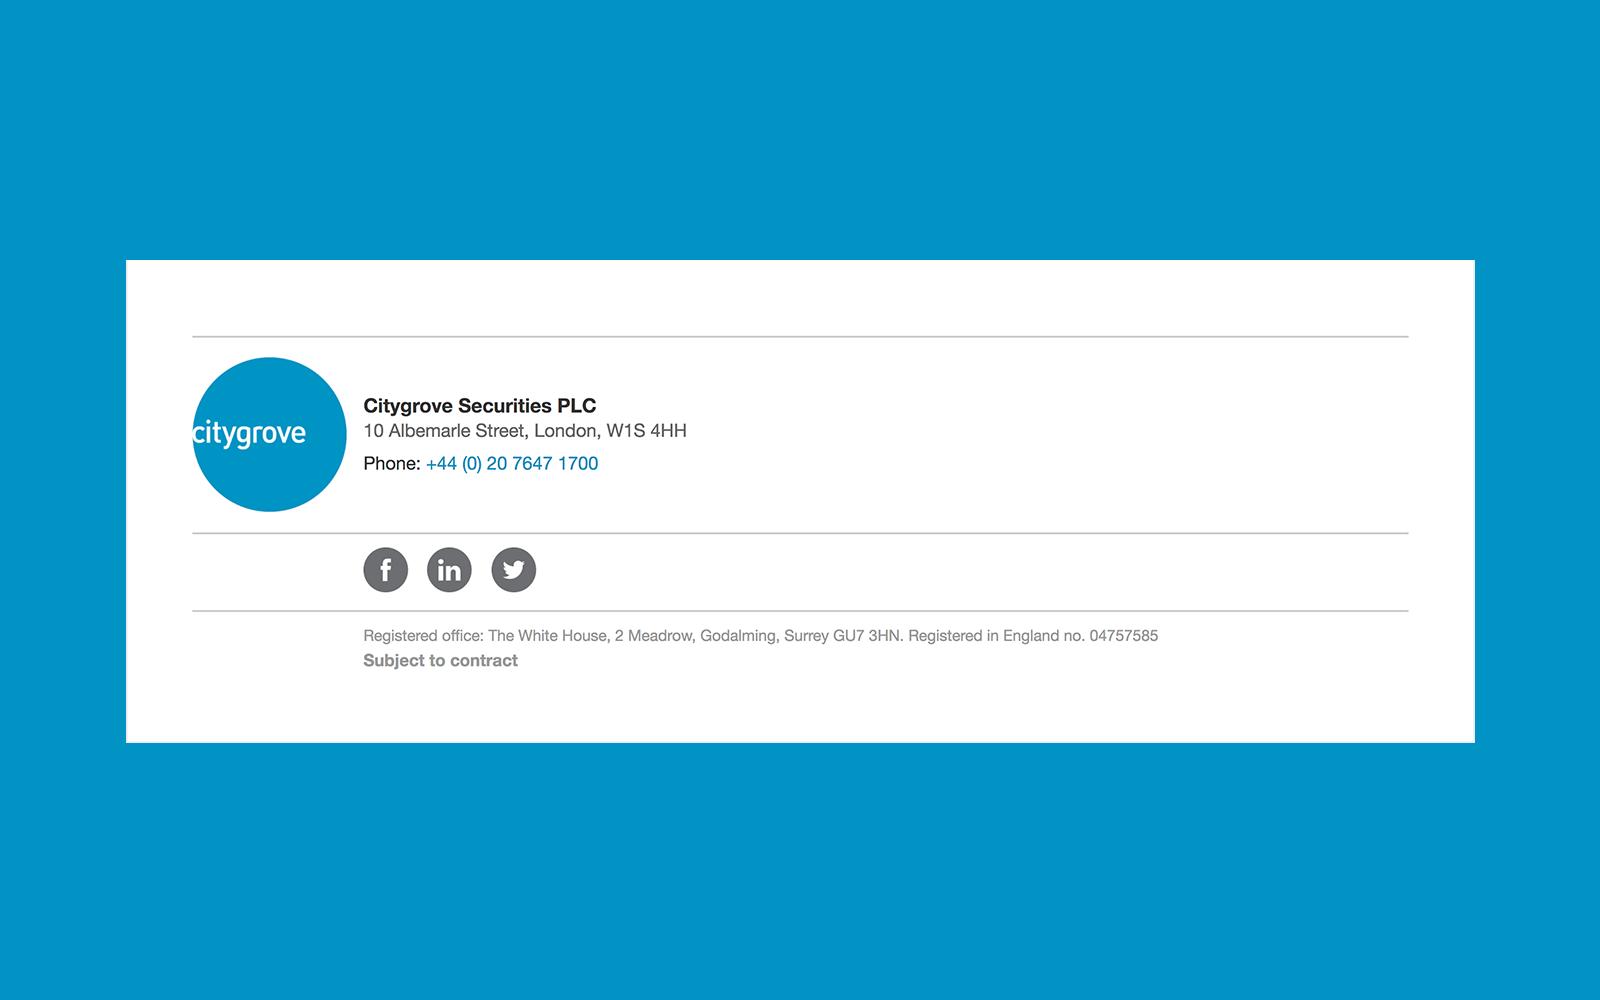 Citygrove email signature